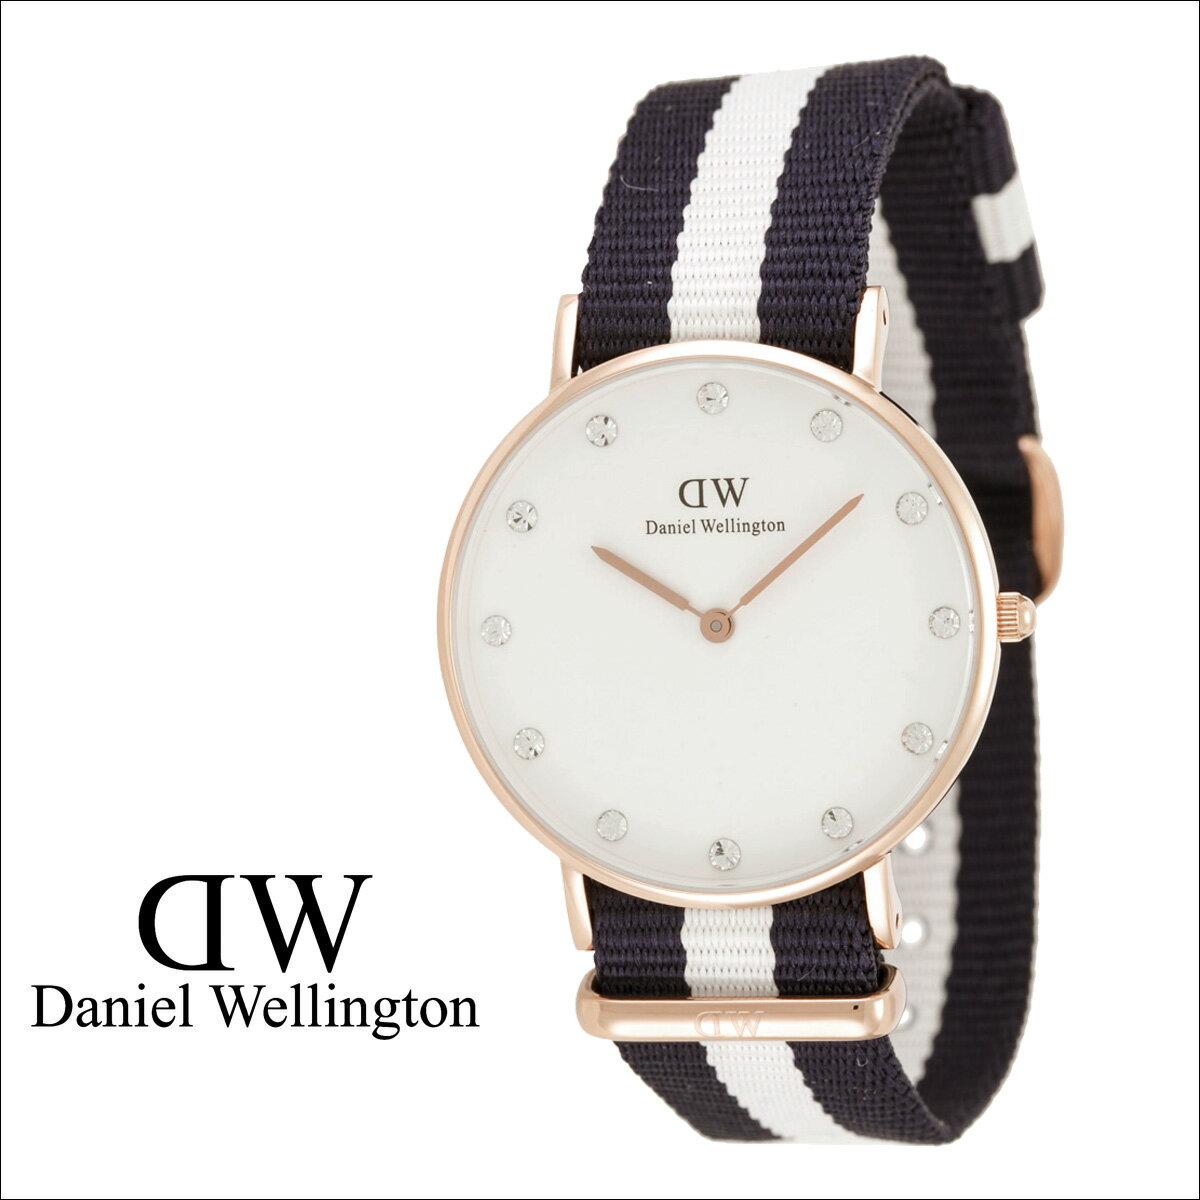 Daniel Wellington ダニエルウェリントン 34mm 腕時計 レディース  0953DW CLASSY GLASGOW  ローズゴールド